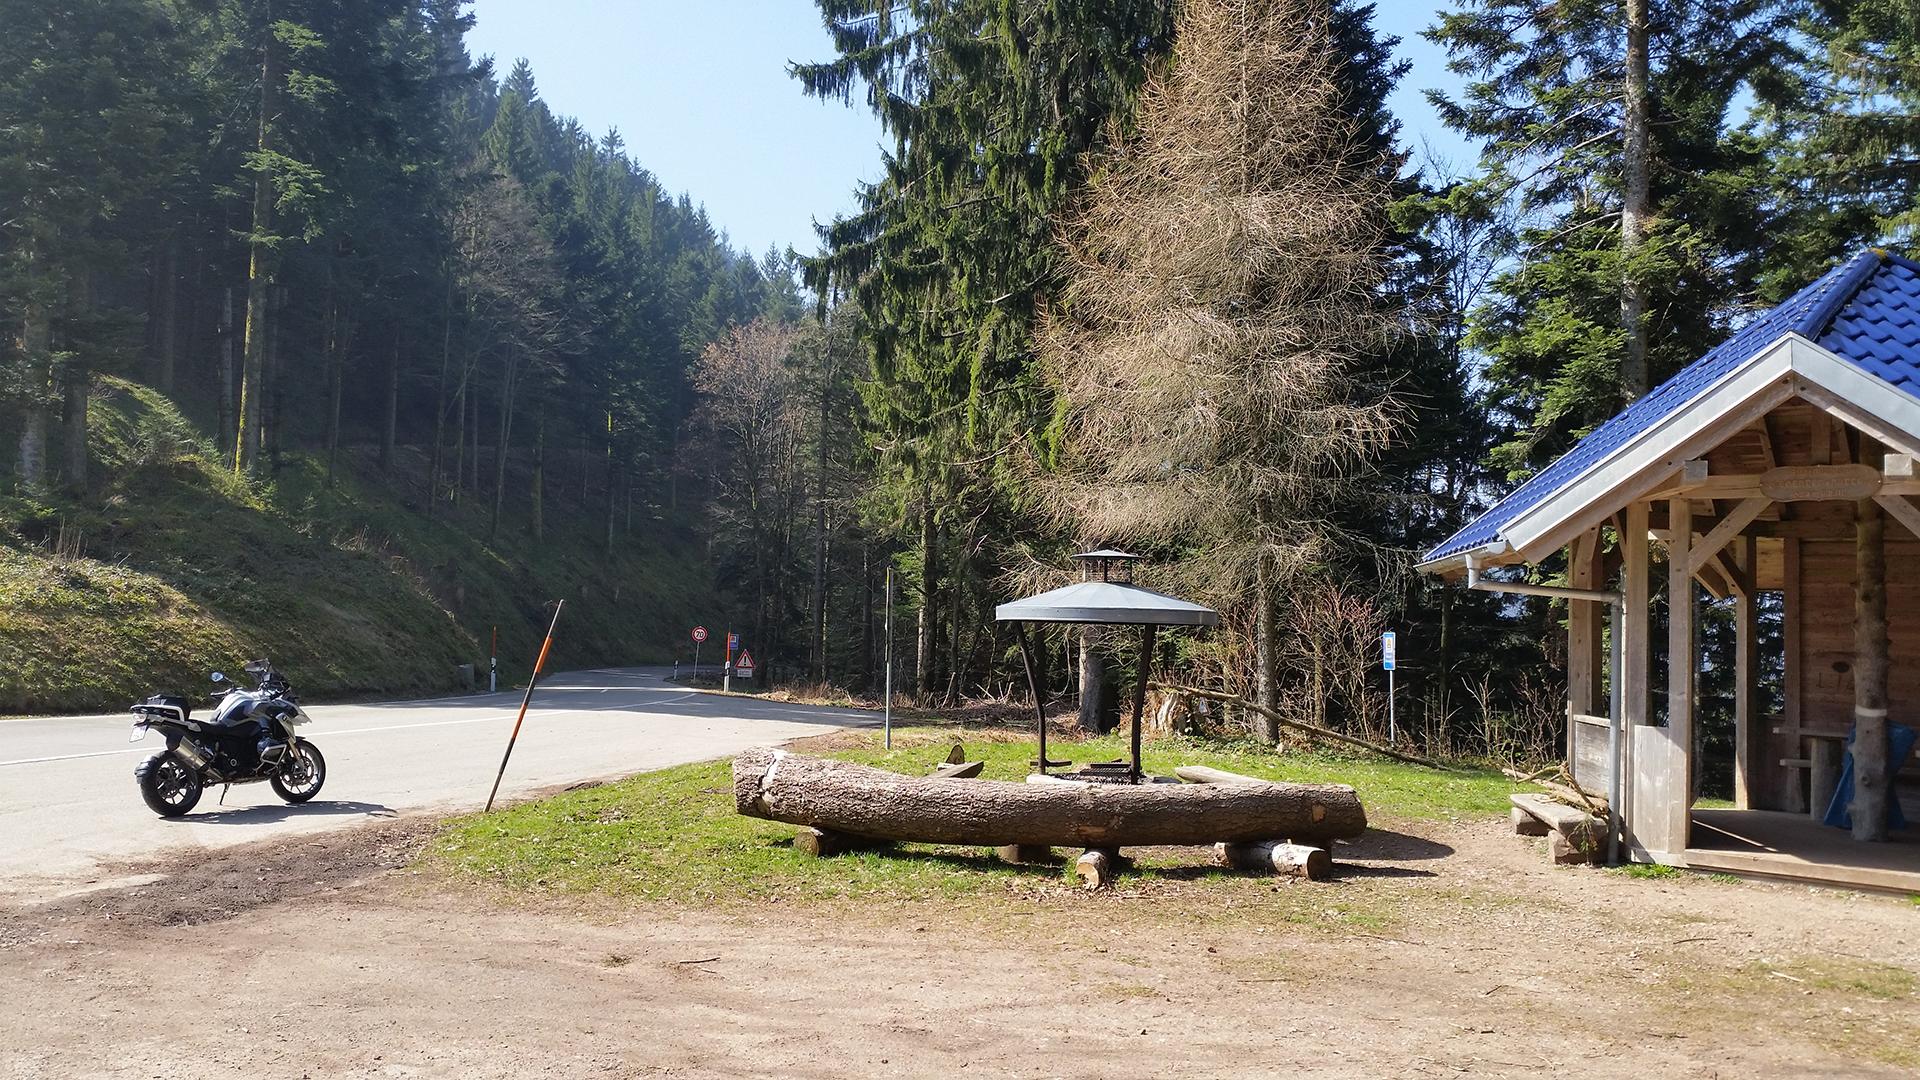 0924 - D - Eberten-Hütte